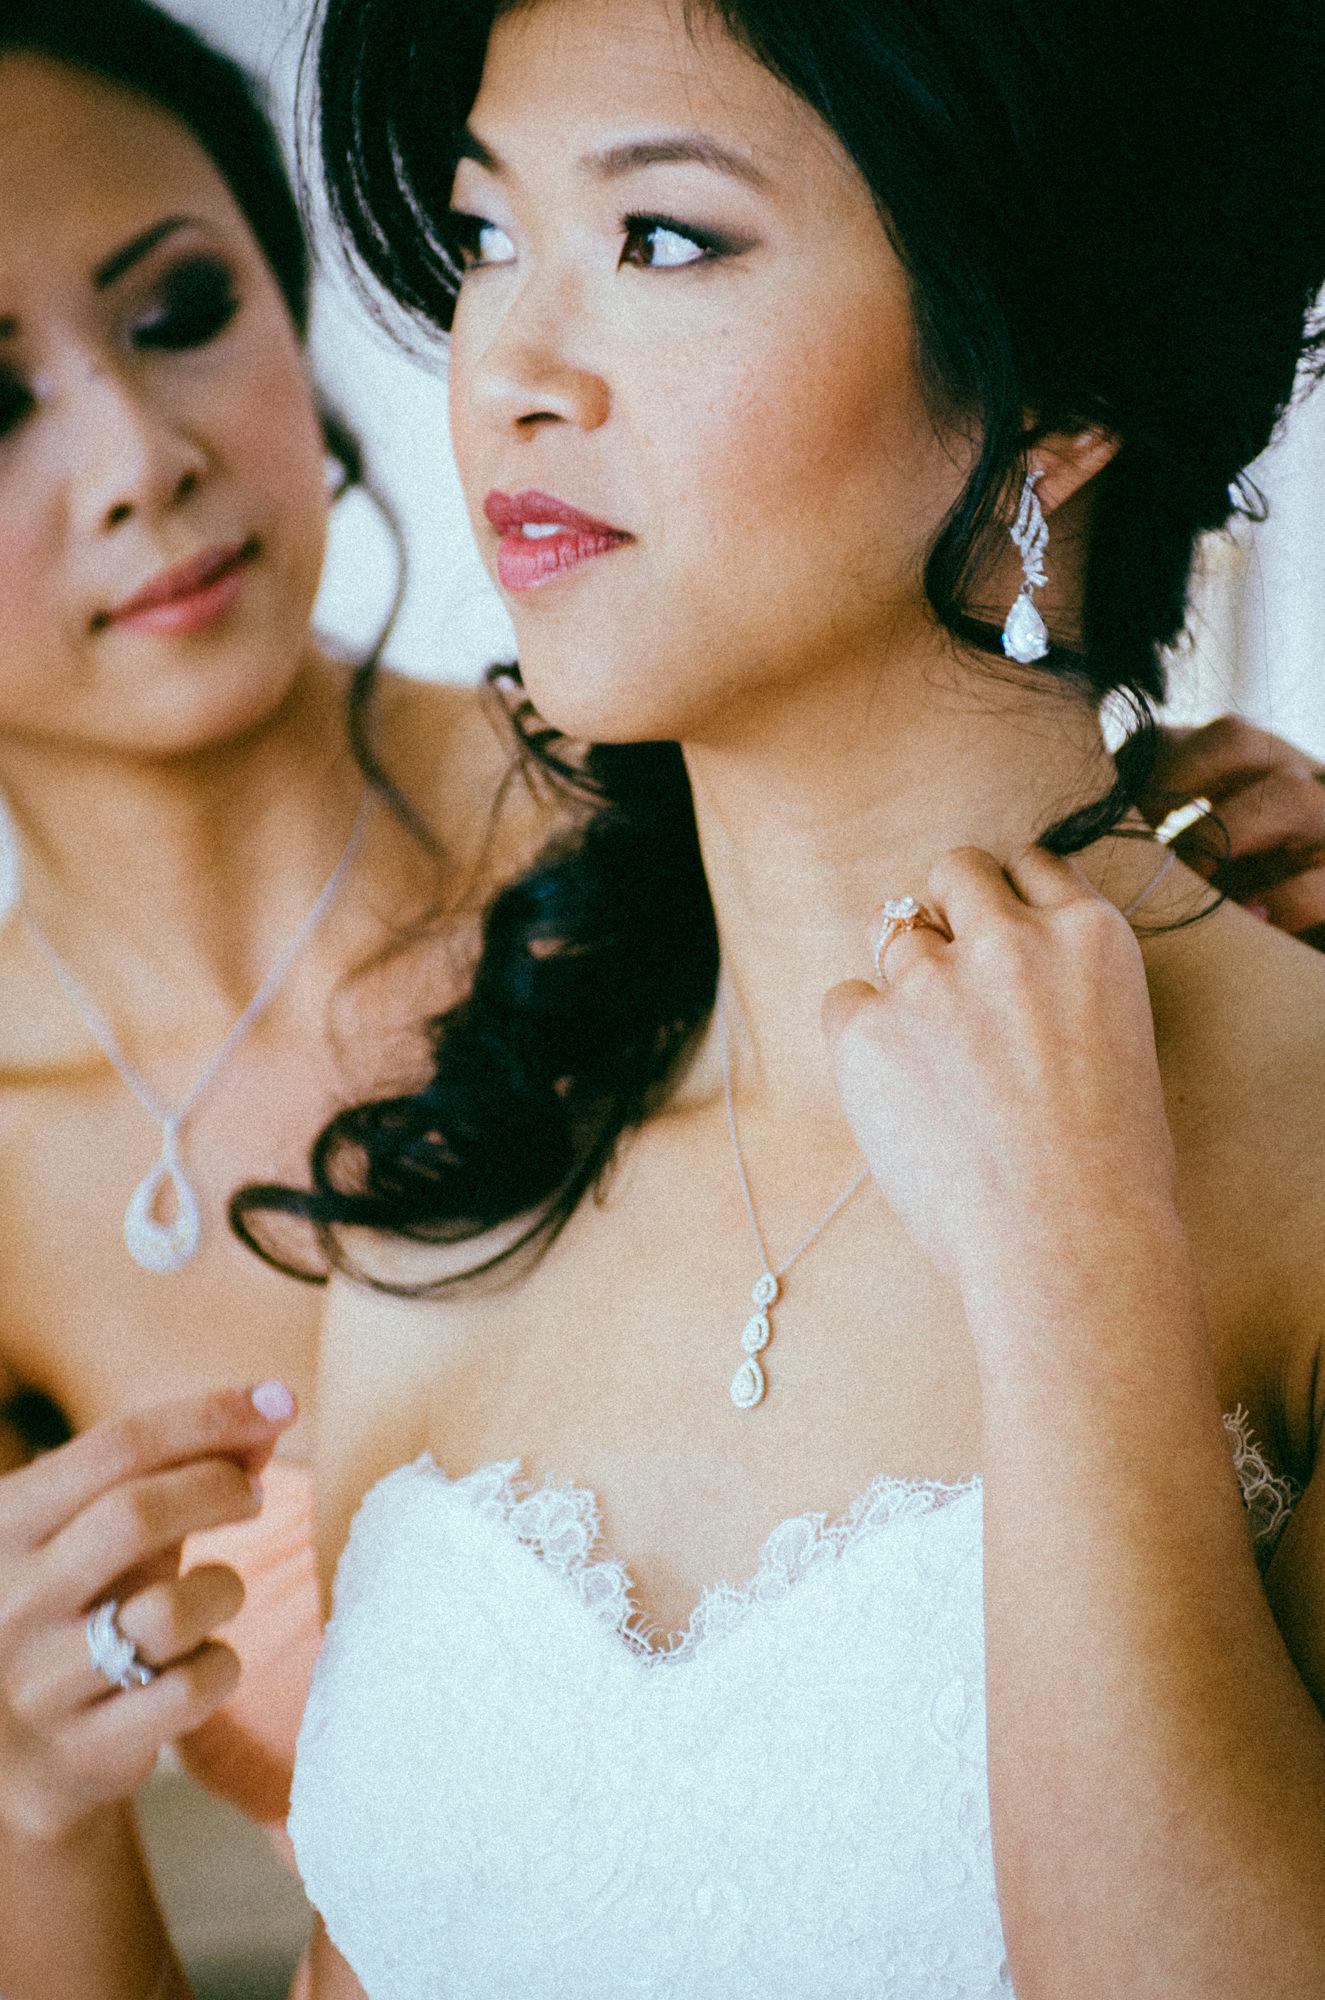 Alice_&_Aaron_Wedding_by_The_Light_&_Glass_Photography-027.jpg